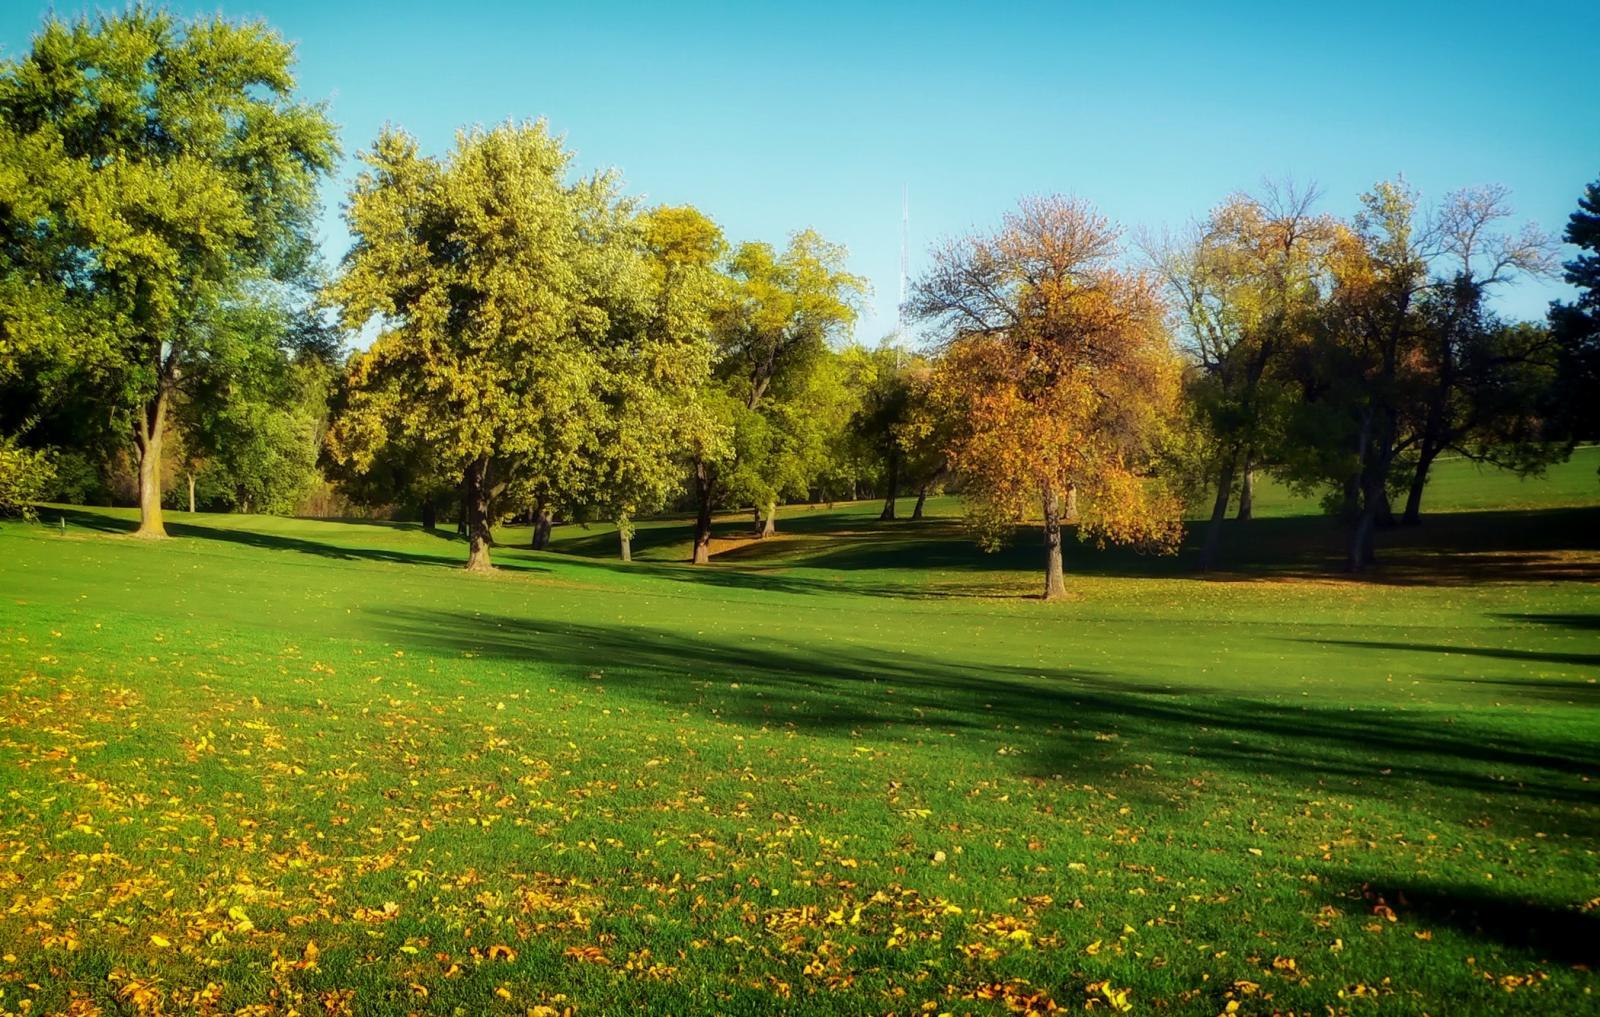 Parkland. Photo credit: Pexels